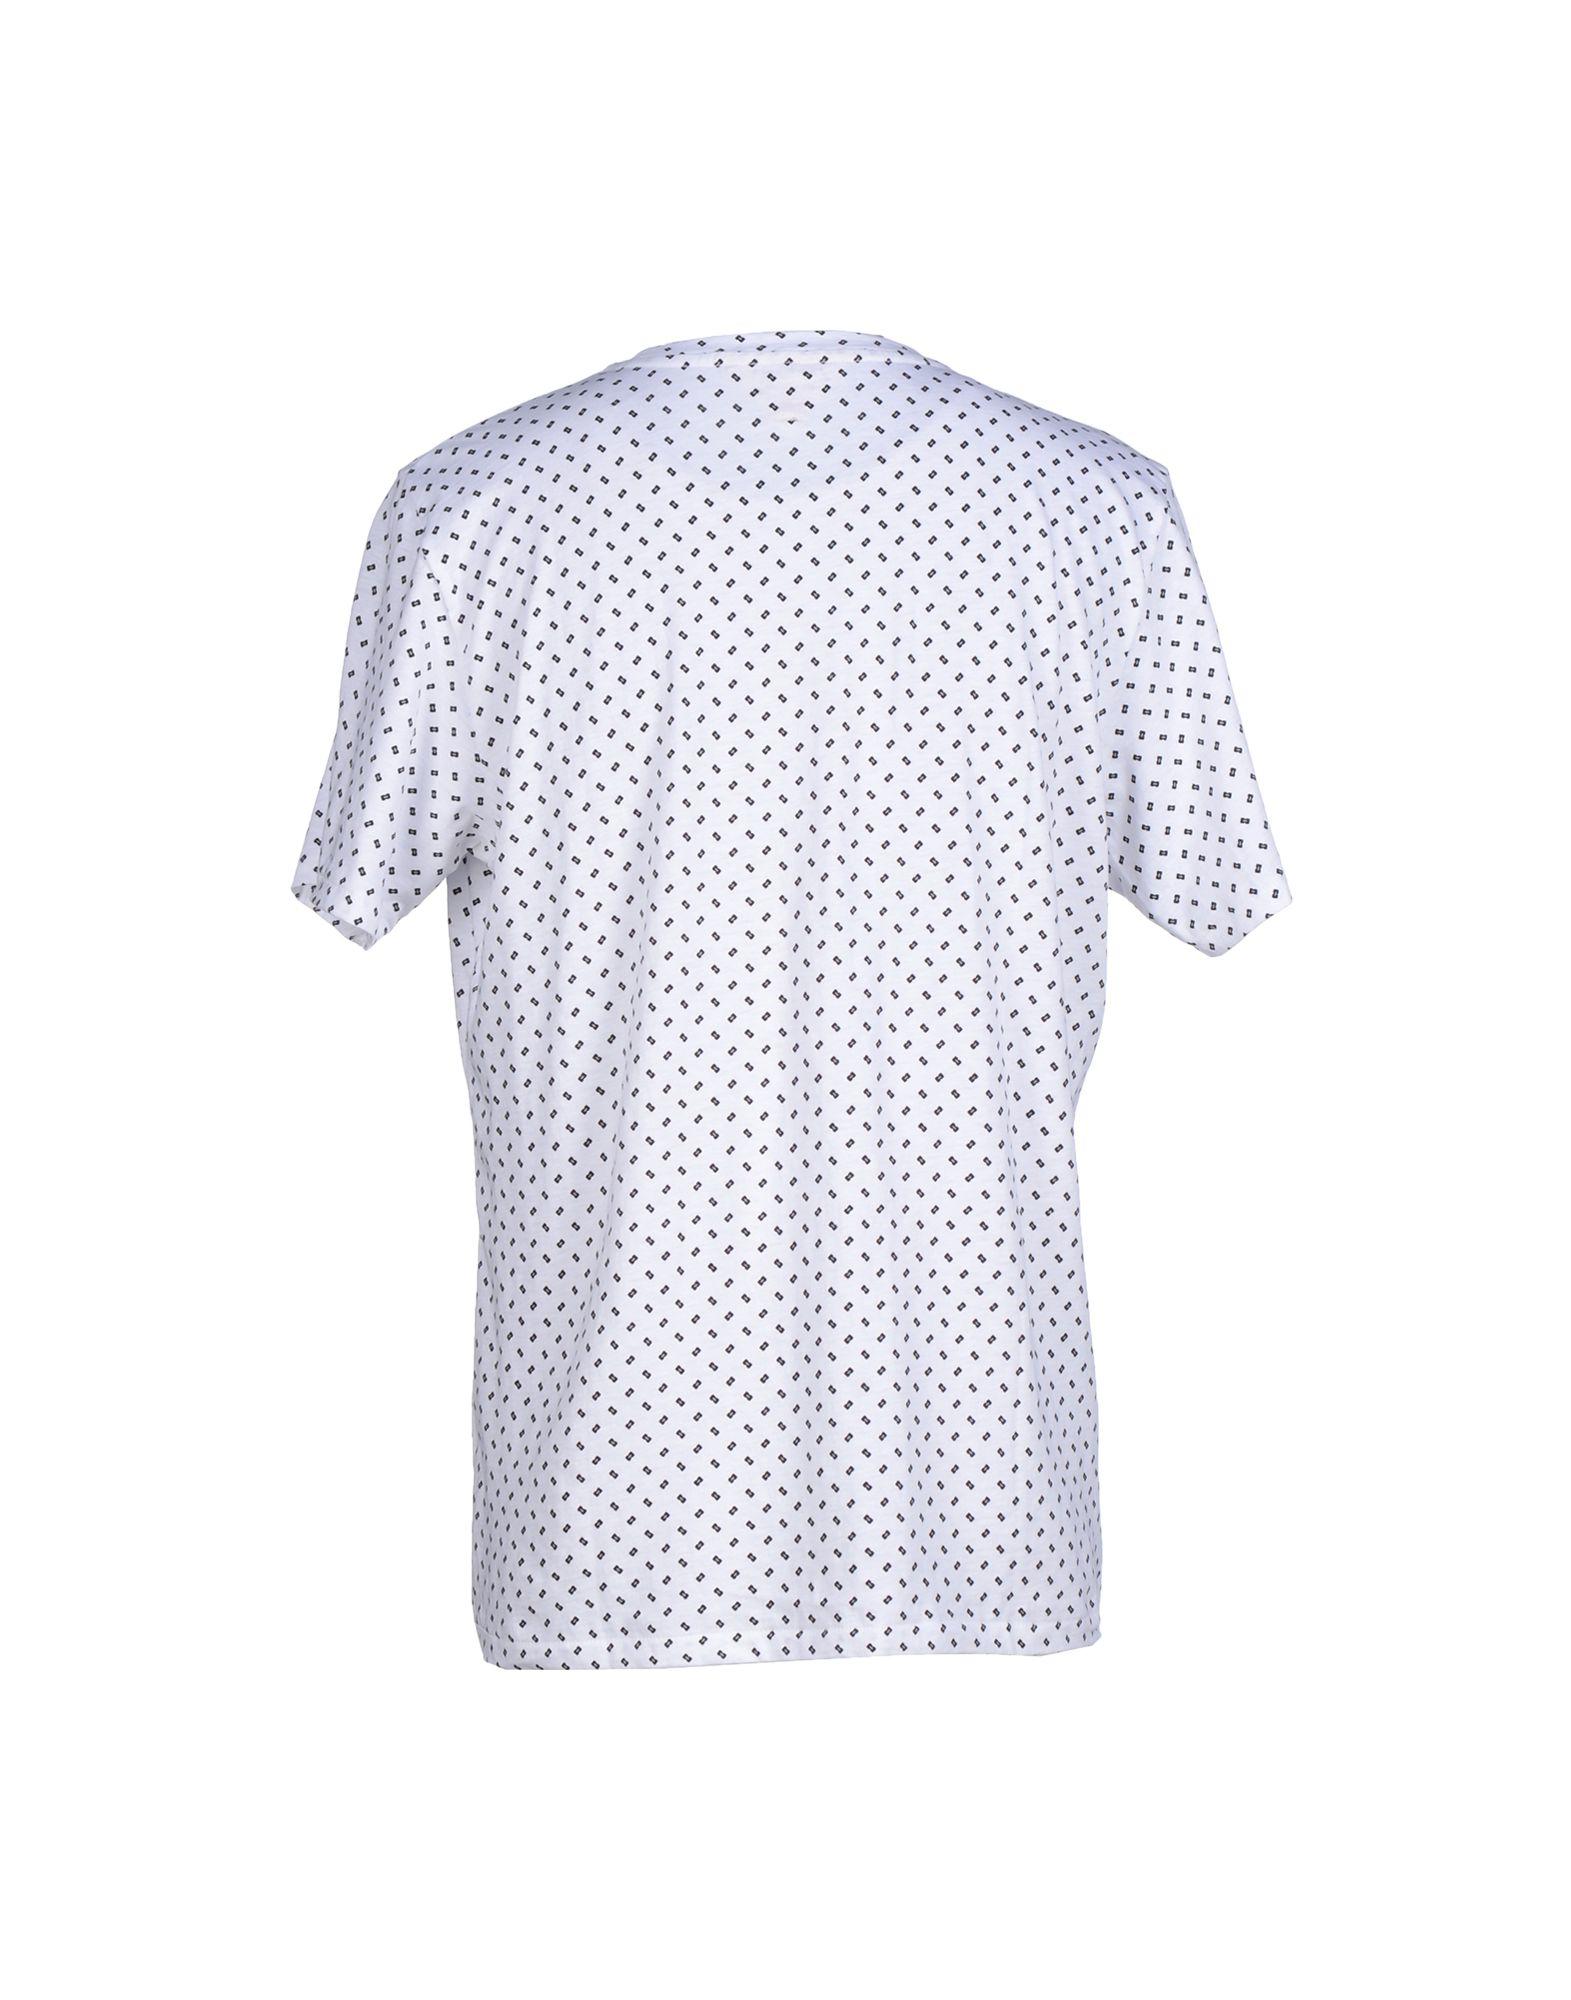 Rag bone t shirt in white for men lyst for Rag and bone t shirts